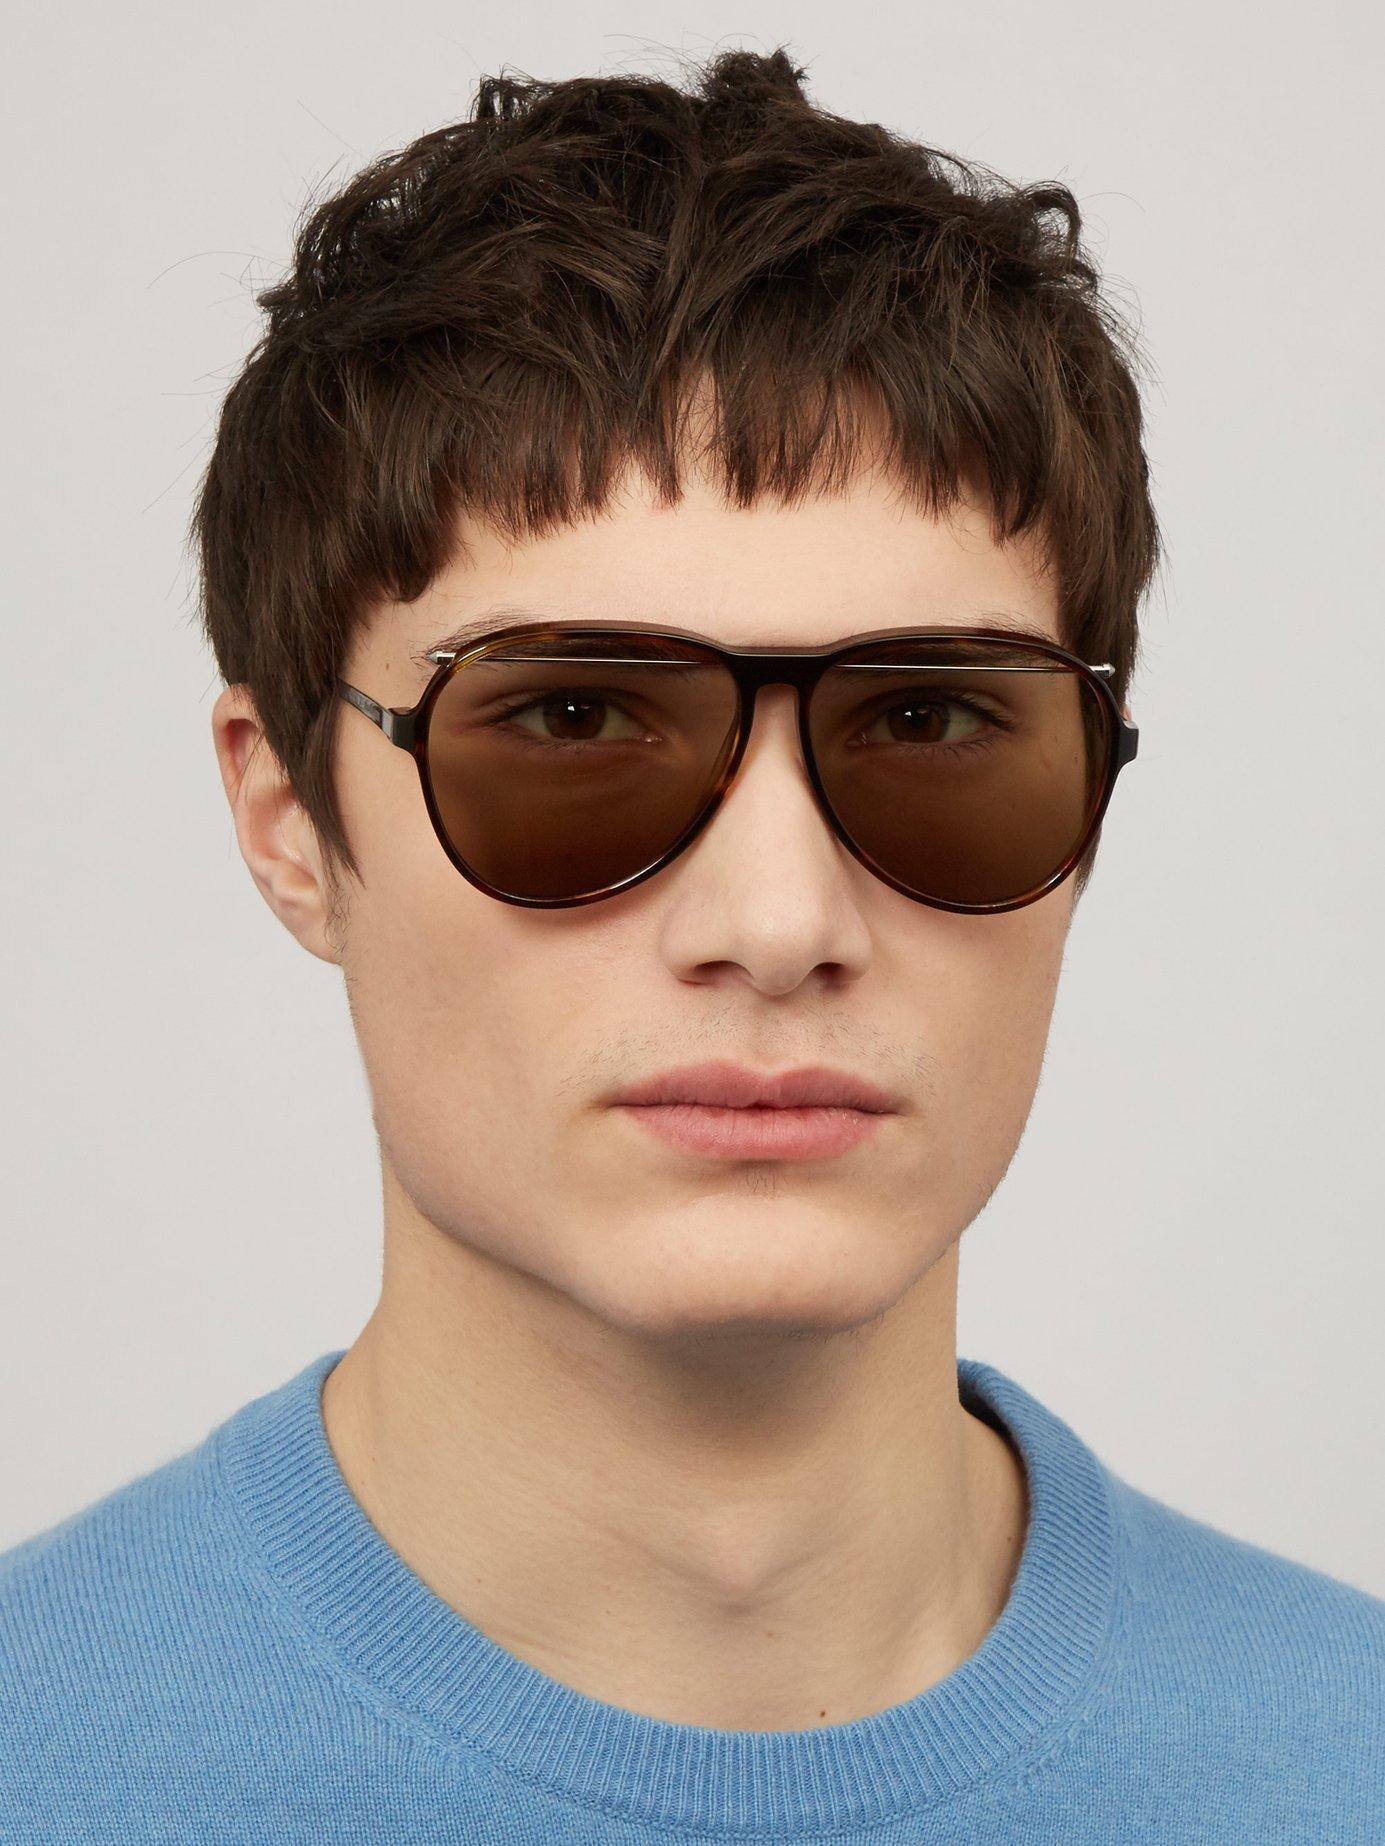 042c800cde8b Lyst - Alexander McQueen Aviator Frame Sunglasses in Brown for Men